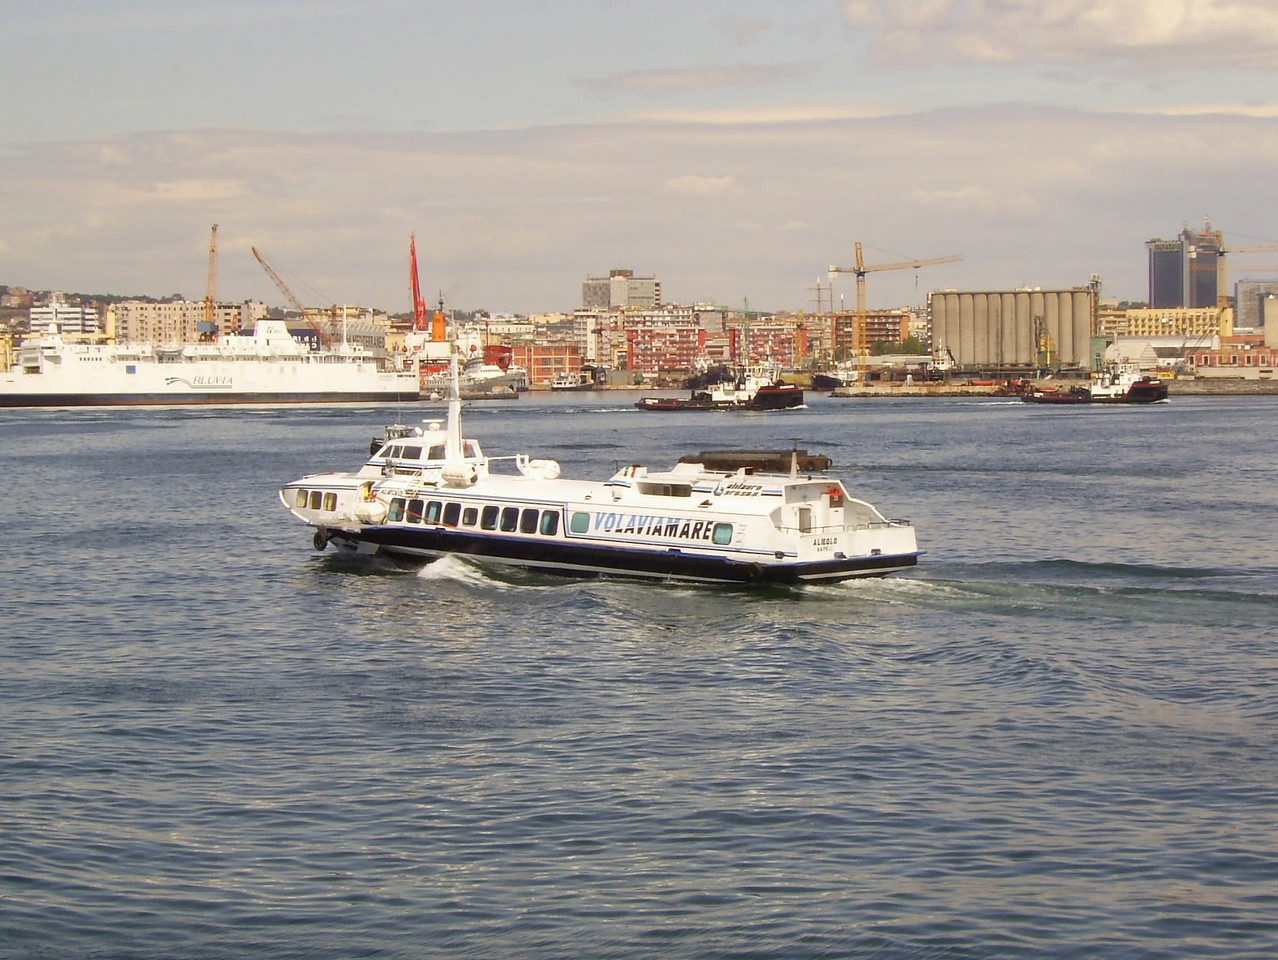 Hydrofoil ALIEOLO arriving to Napoli.